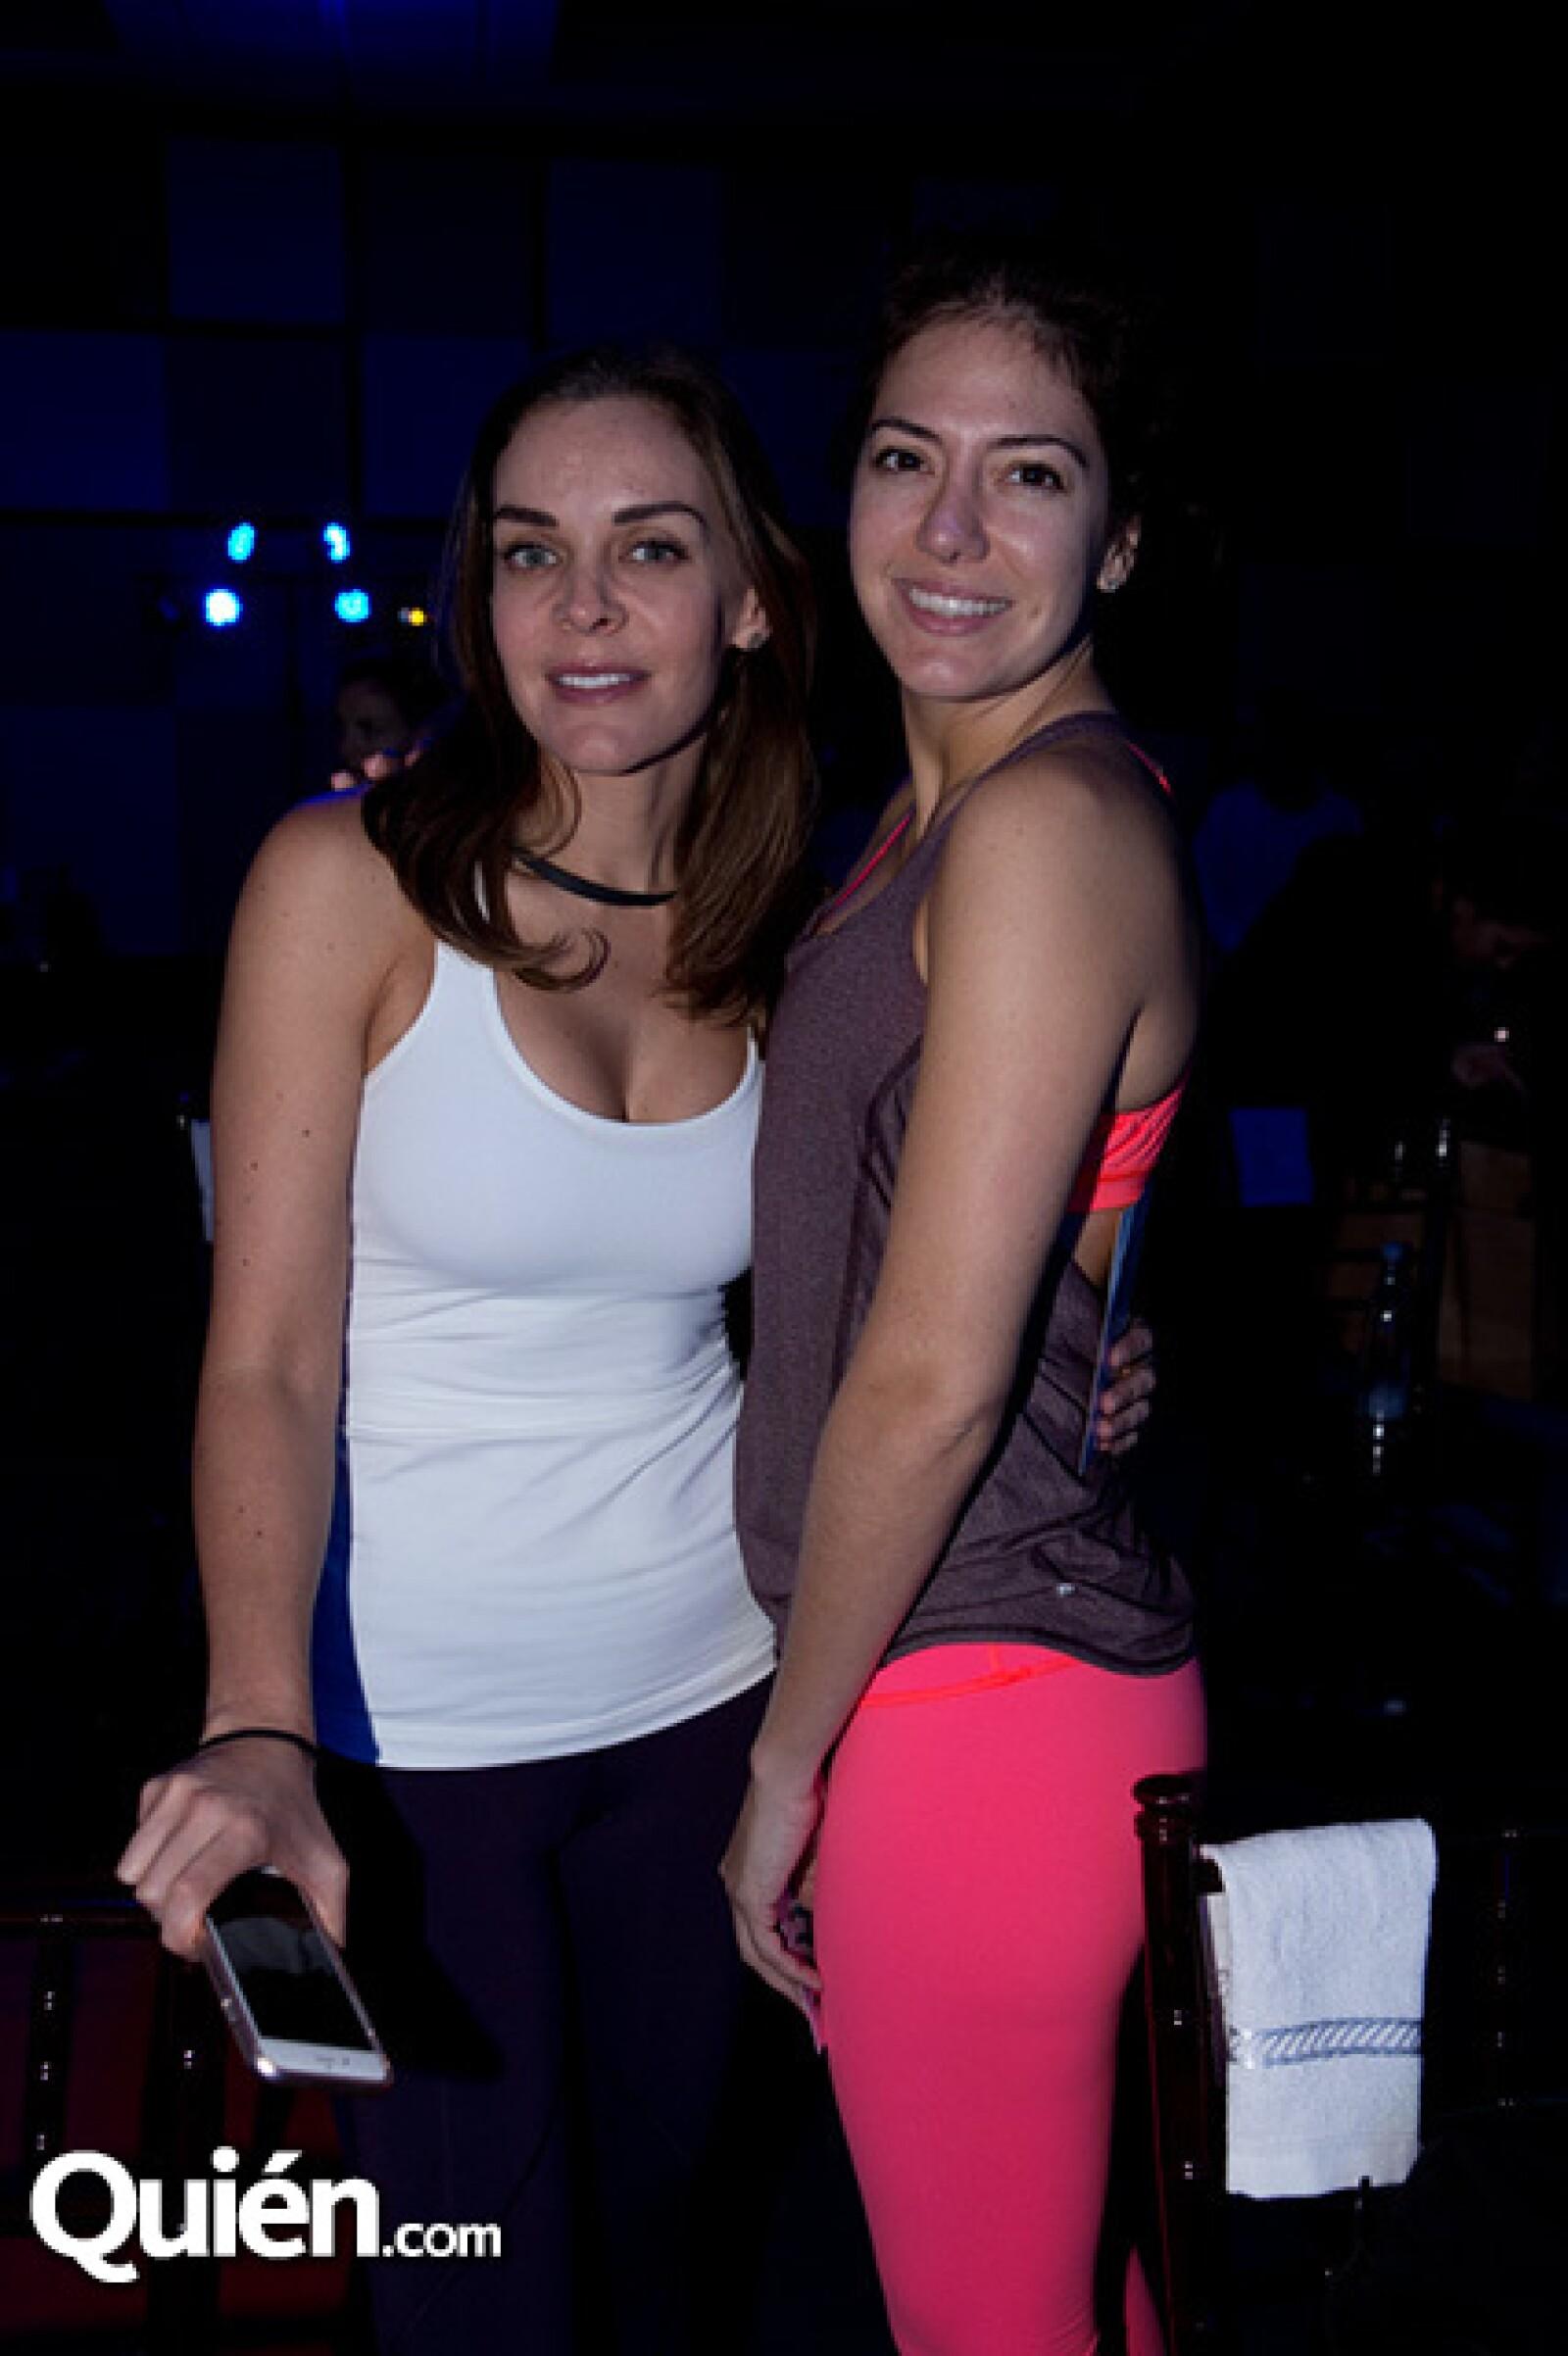 Cristina Salomón y Priscila Avellaneda